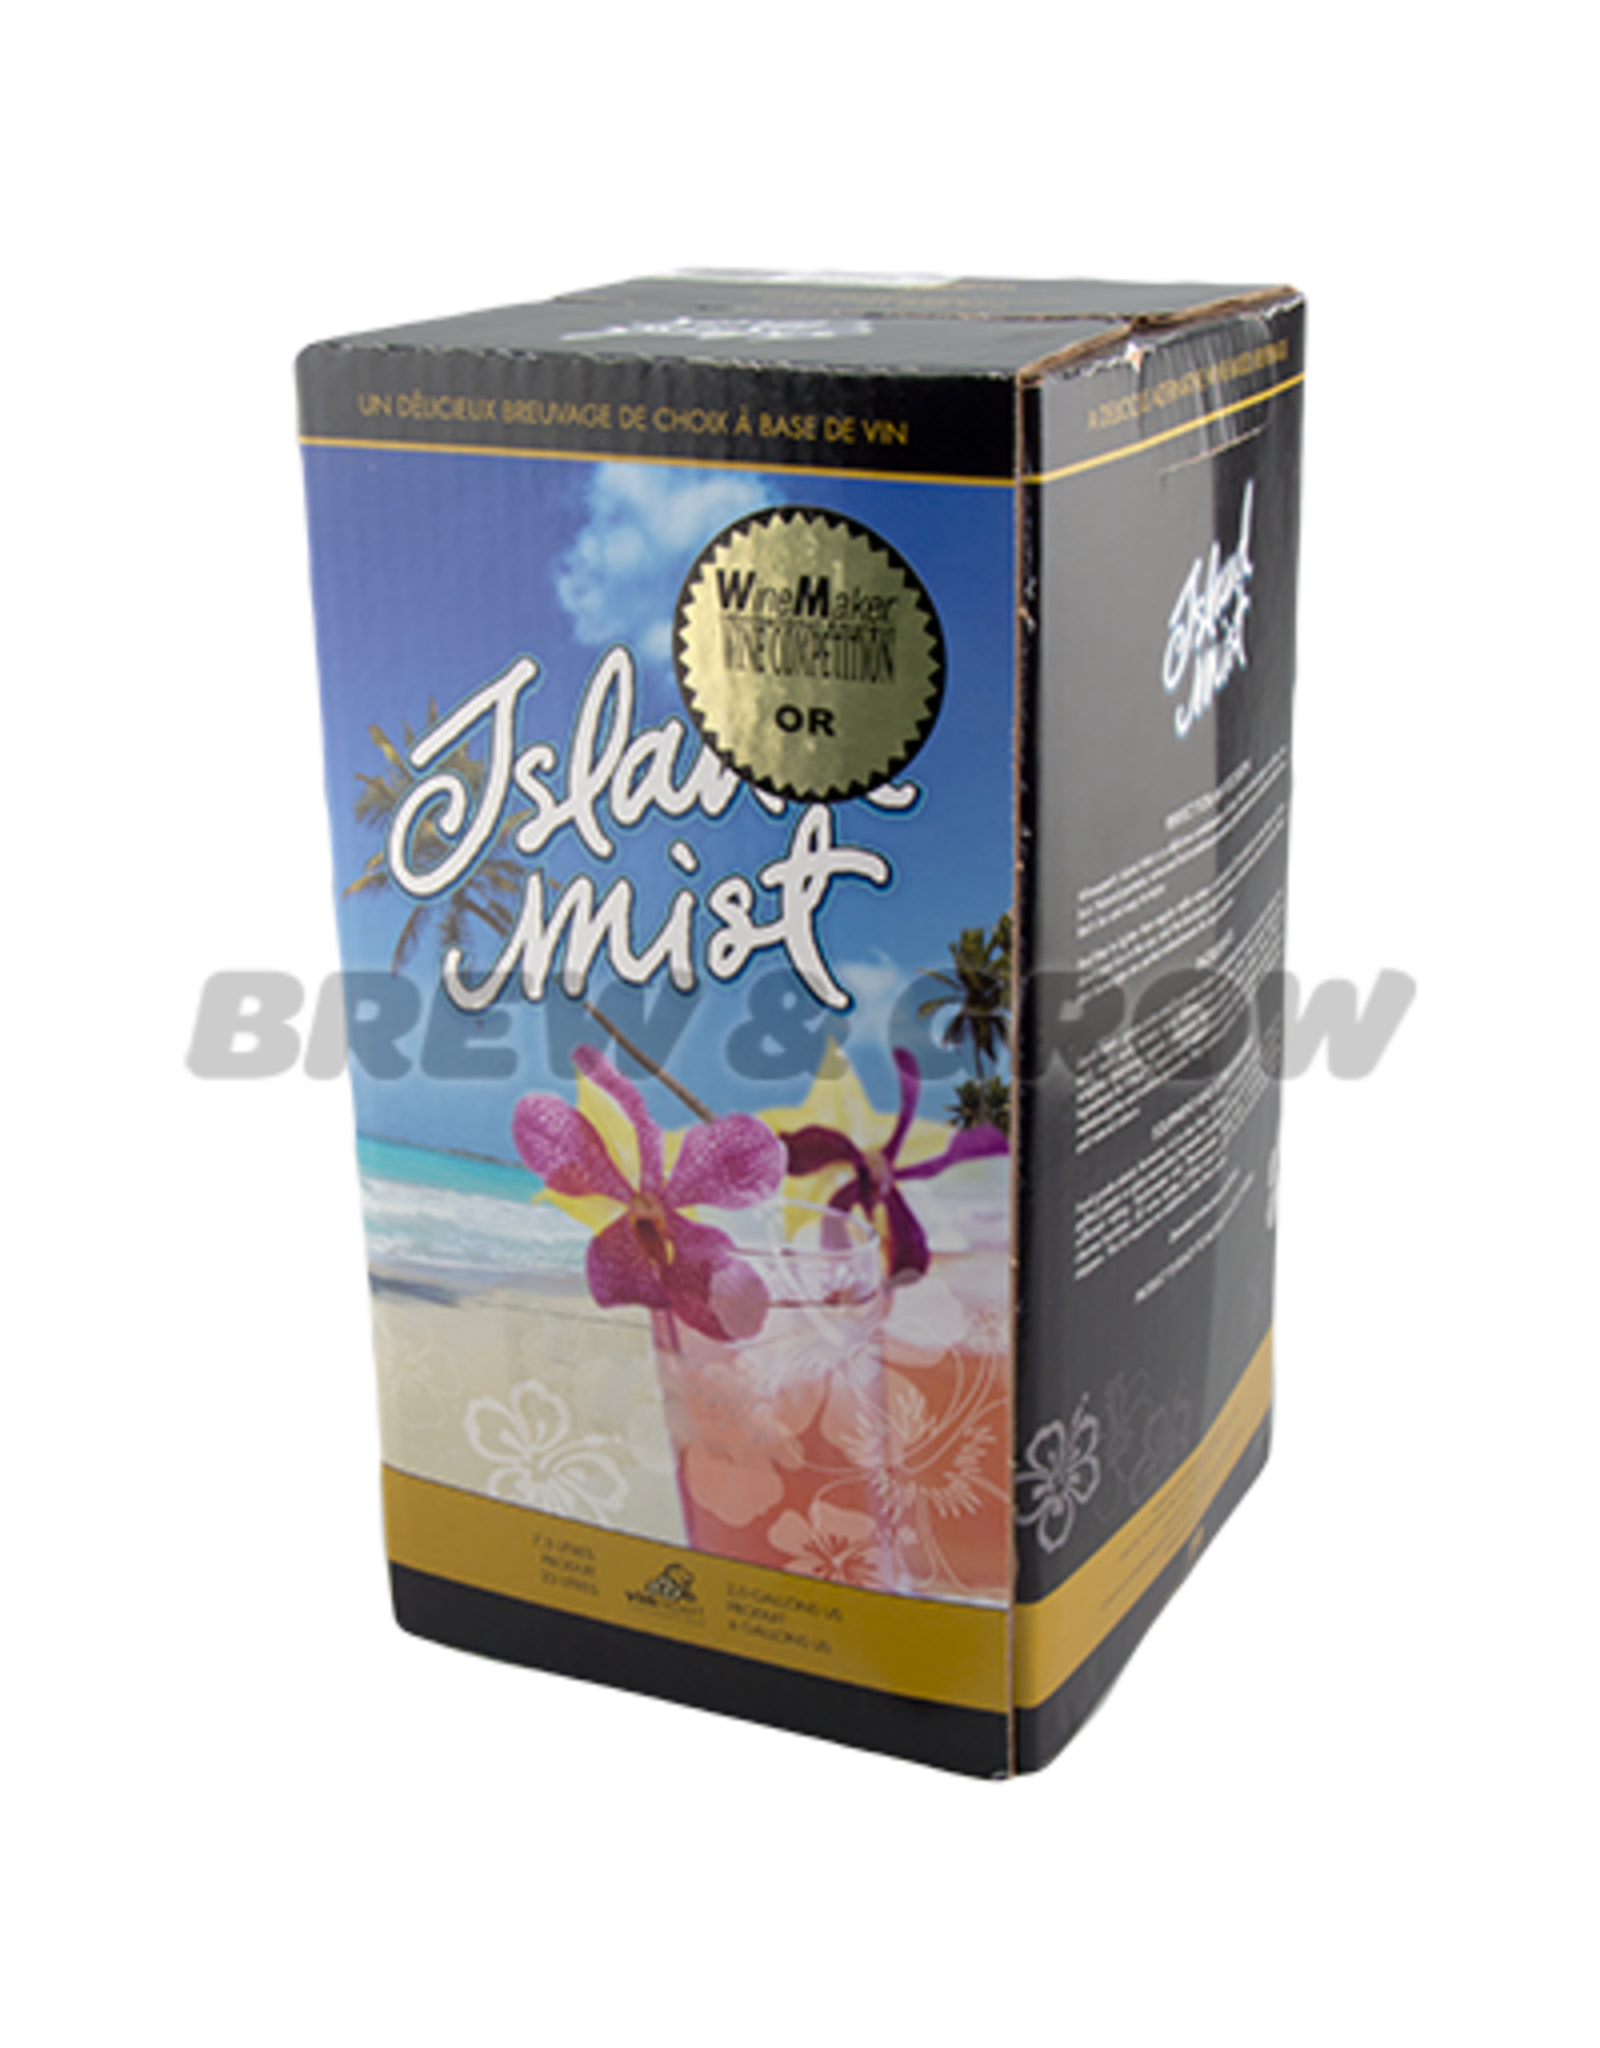 Island Mist Island Mist - Strawberry White Merlot